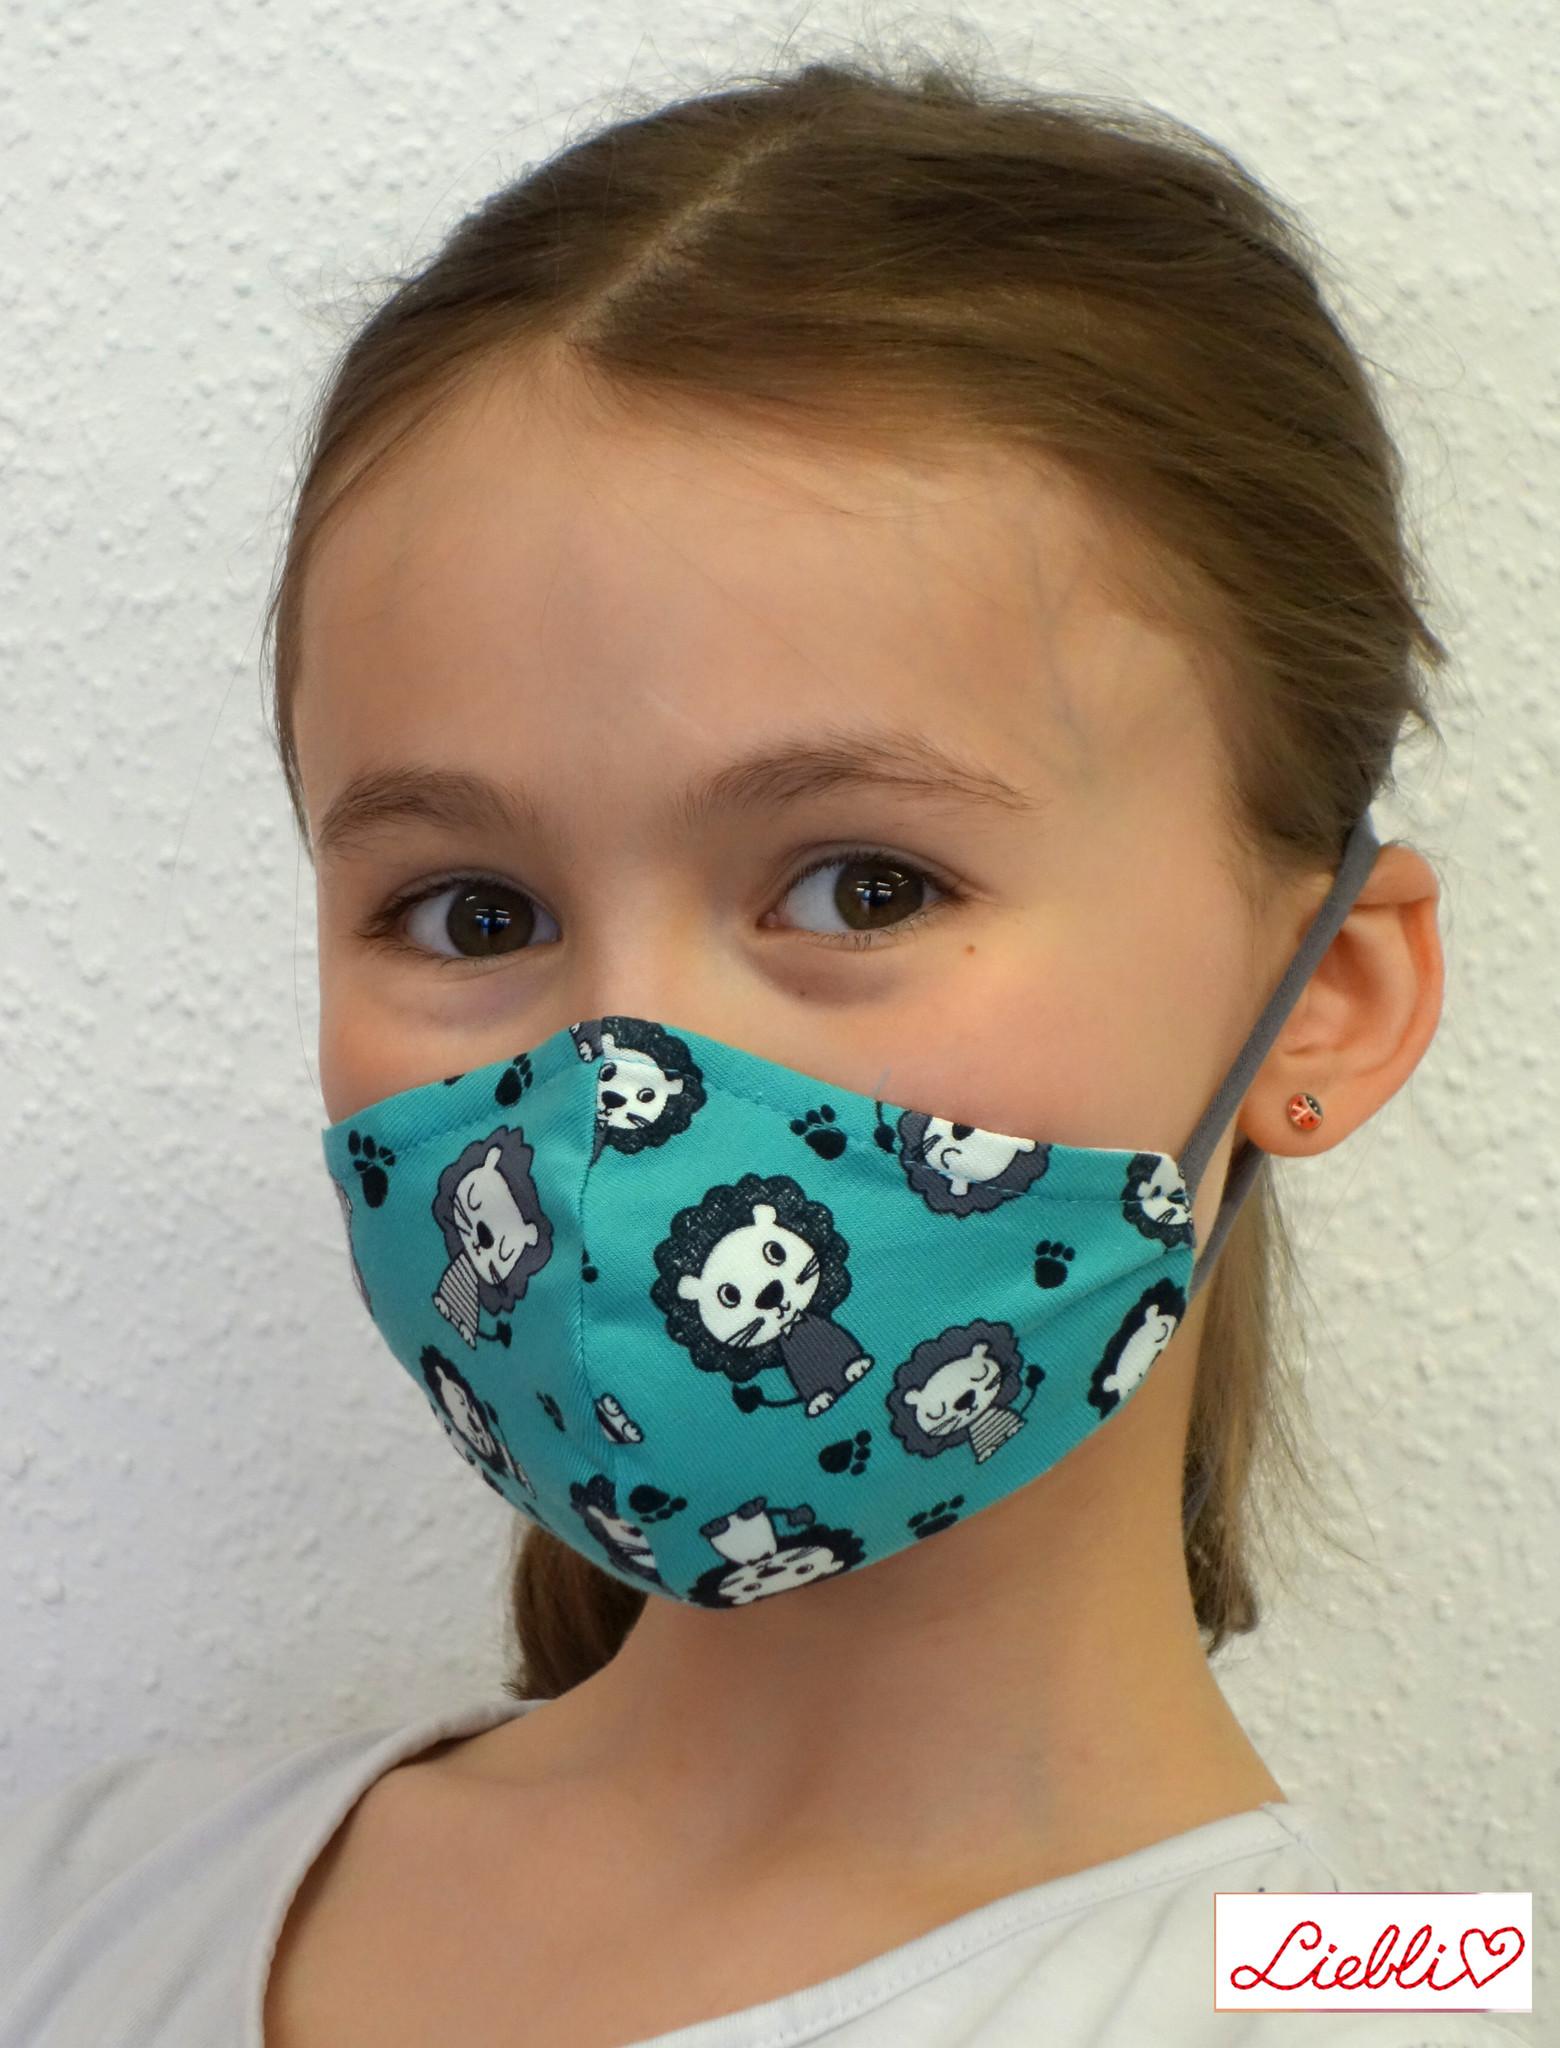 Kindermaske, Kinder Mundschutz, Mund-Nasen-Maske Löwen türkis